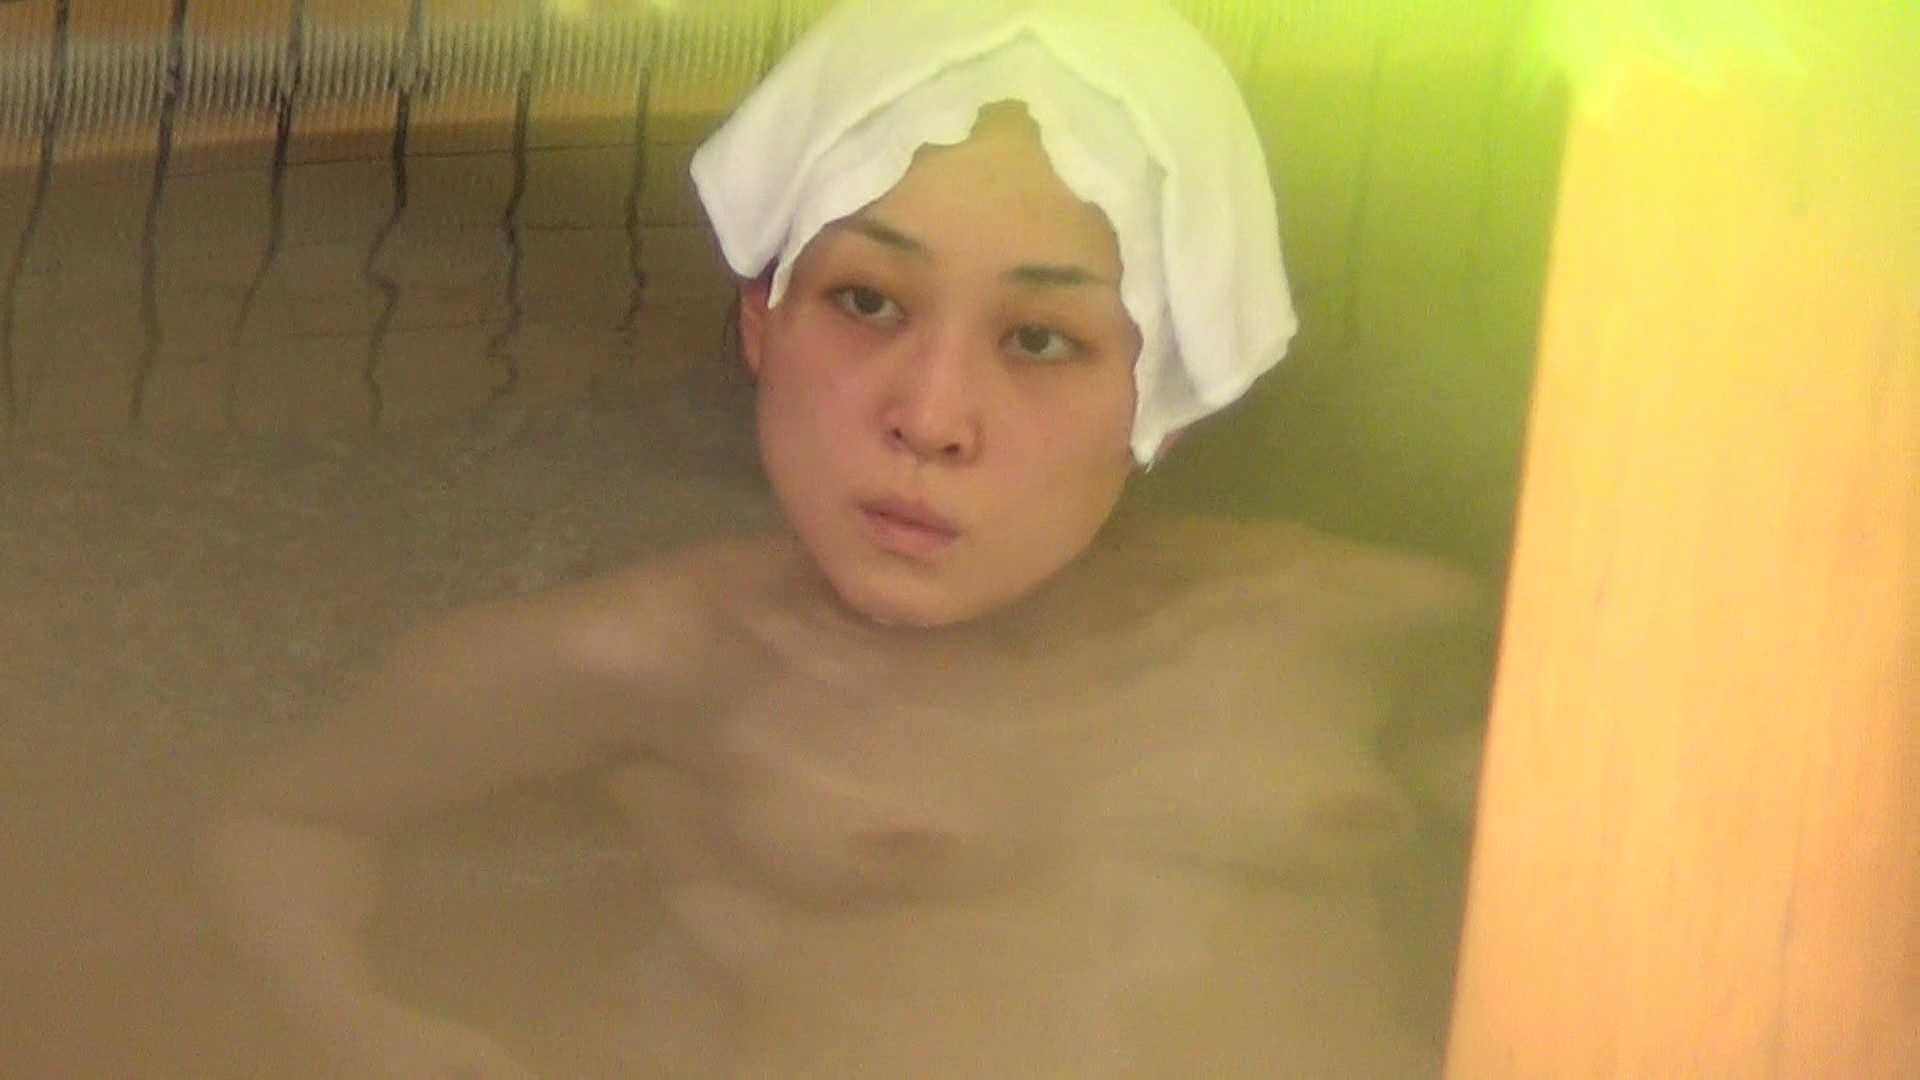 Aquaな露天風呂Vol.231 HなOL オメコ動画キャプチャ 113pic 58